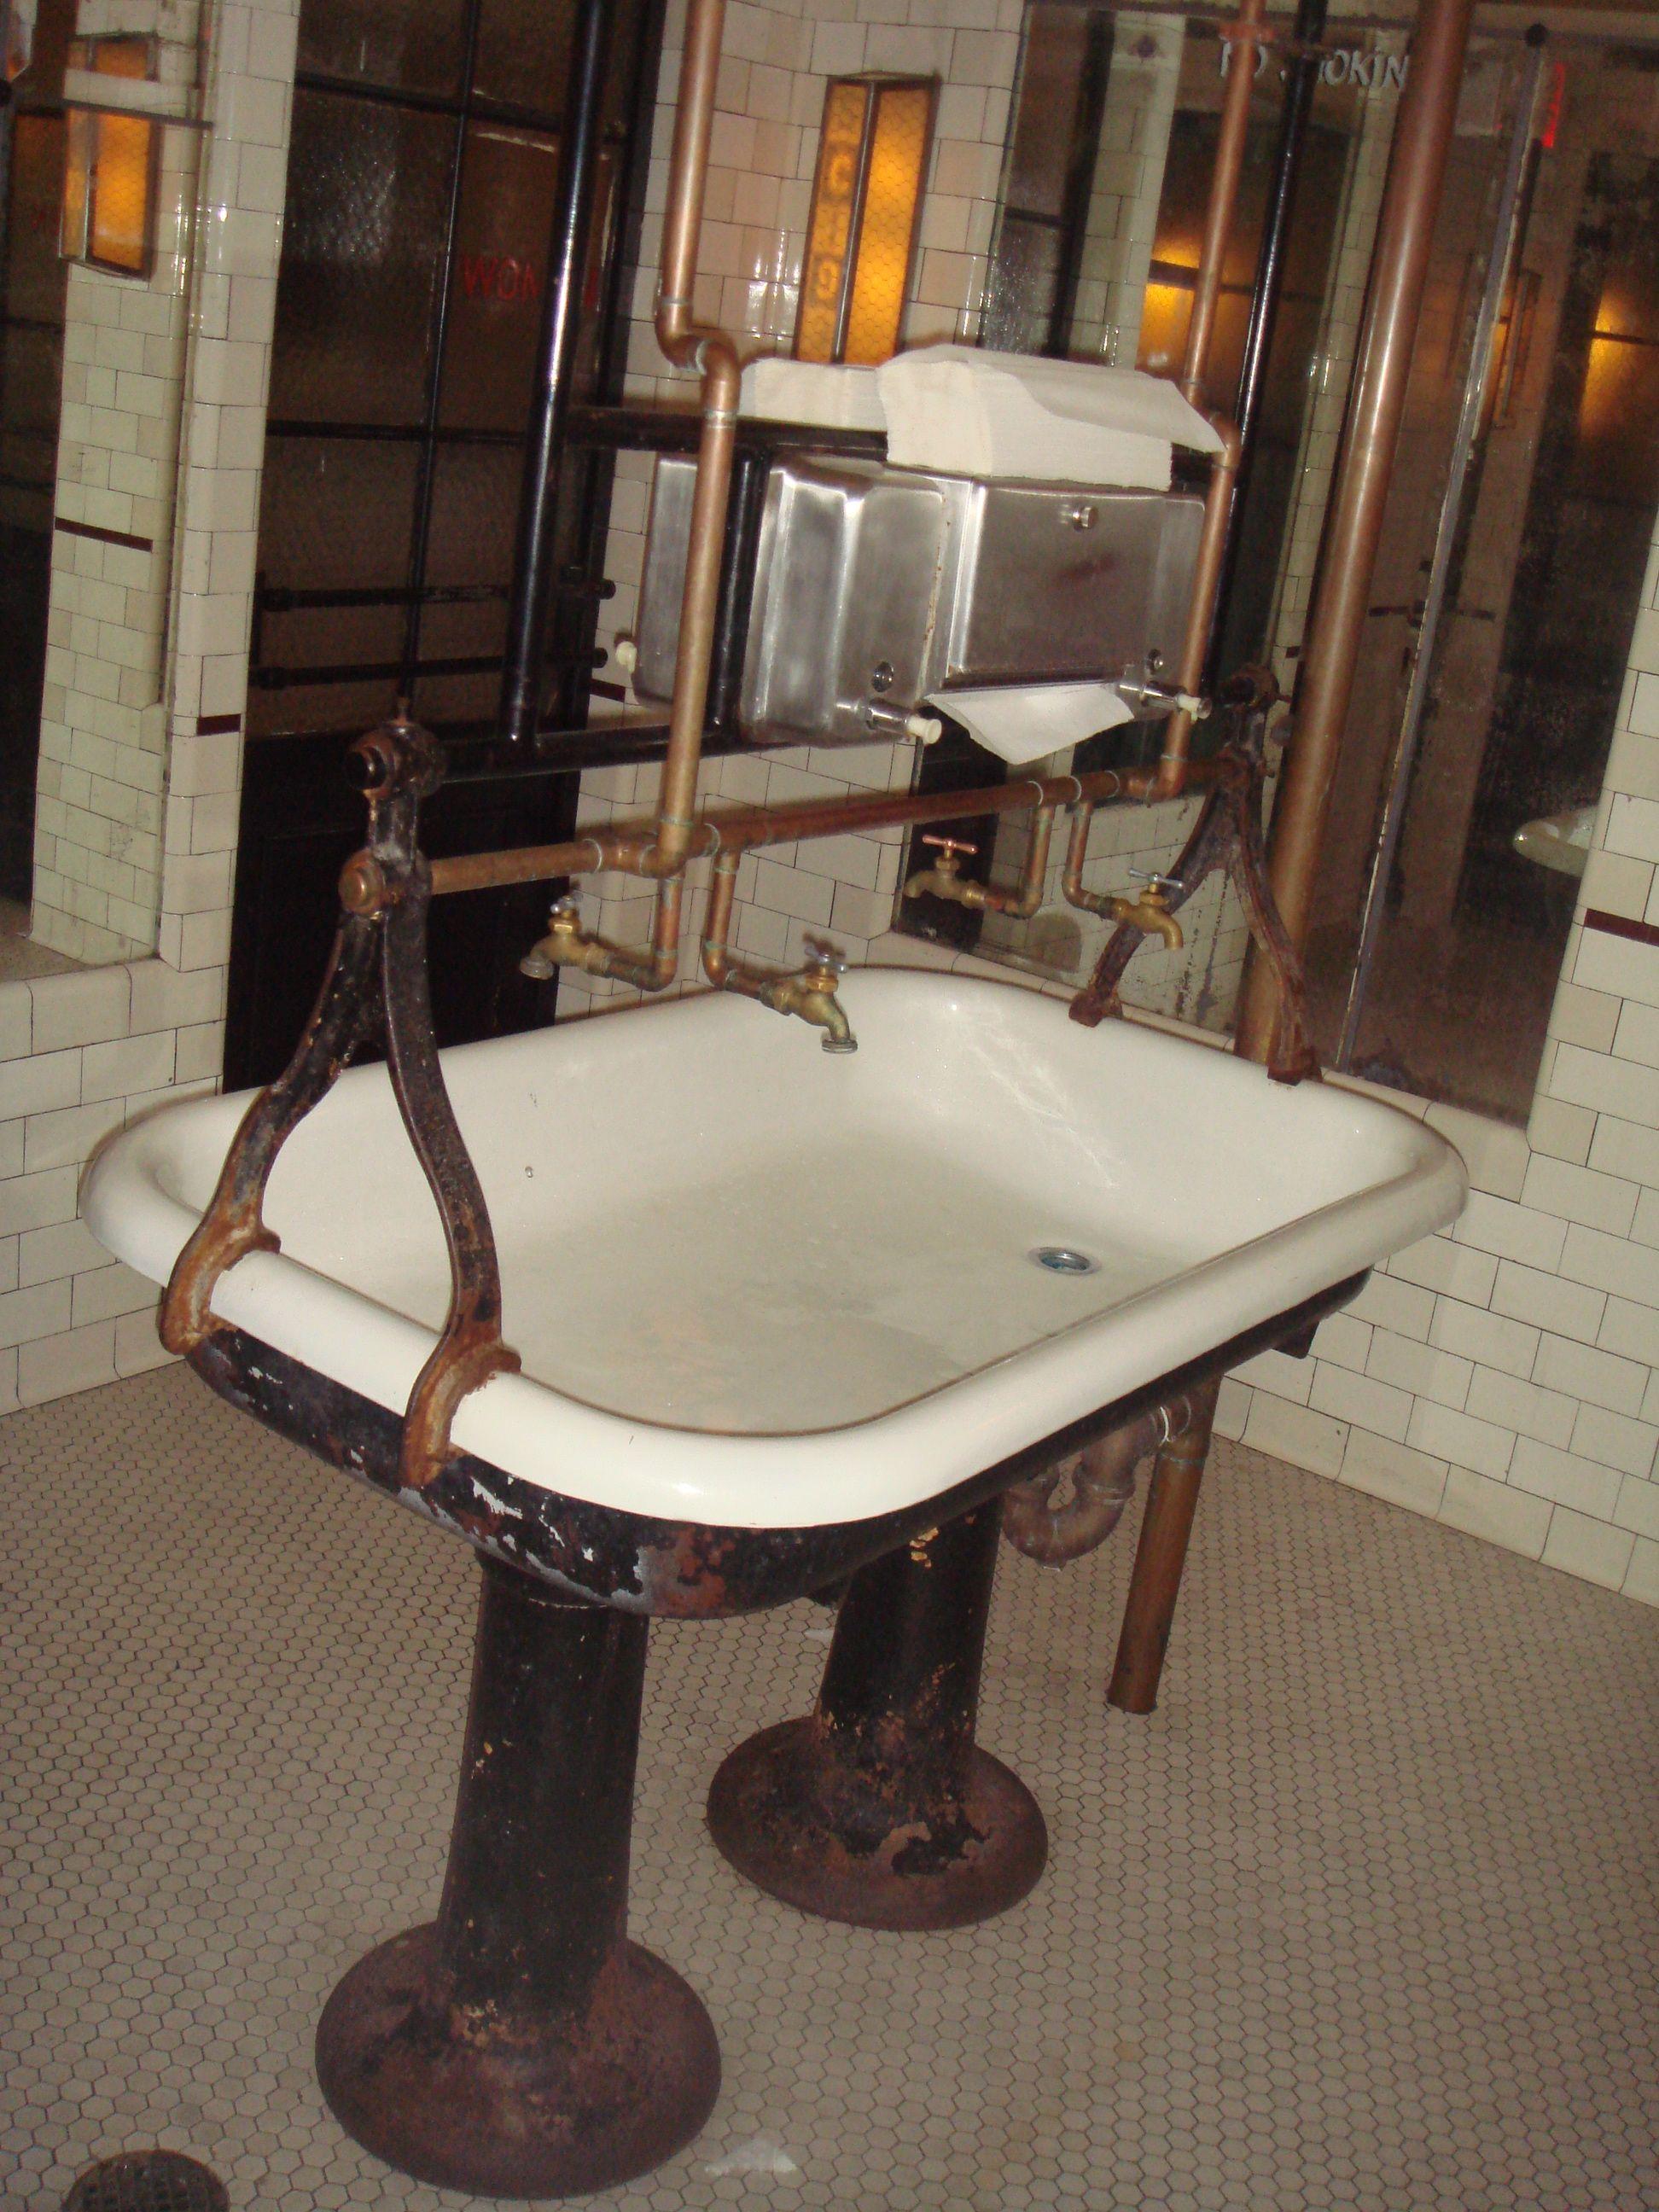 Funky Bathroom Communal Sink Schillers Liquor Bar Nyc Again Repurposed